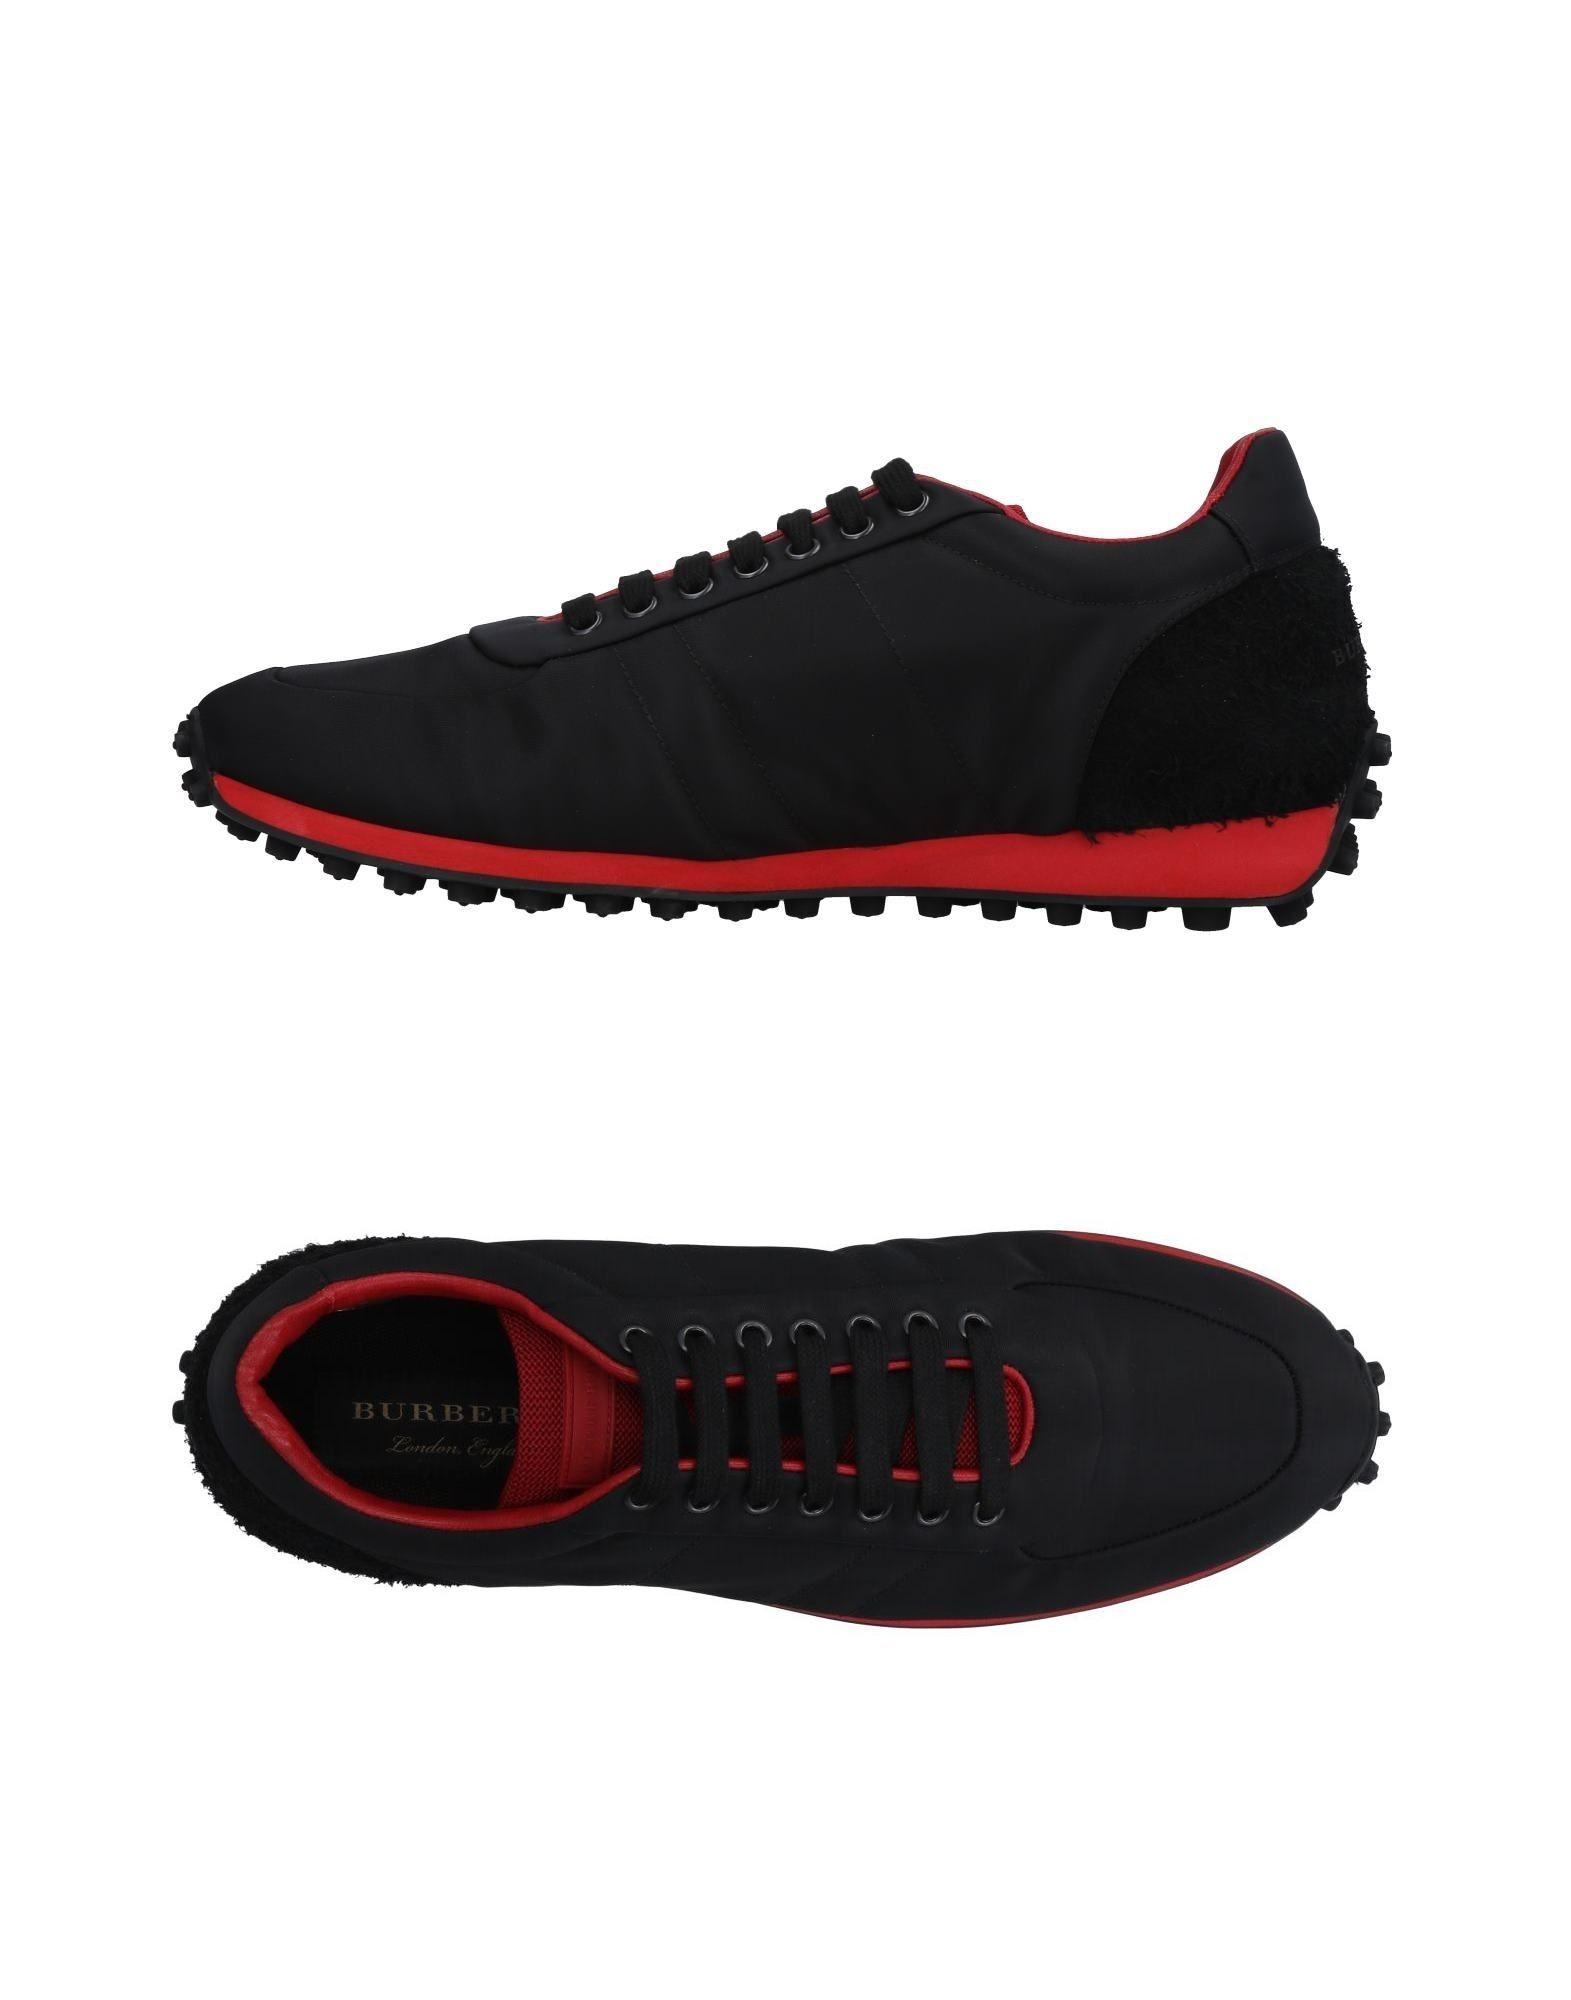 Burberry Burberry Burberry Sneakers Herren Gutes Preis-Leistungs-Verhältnis, es lohnt sich ae1a67